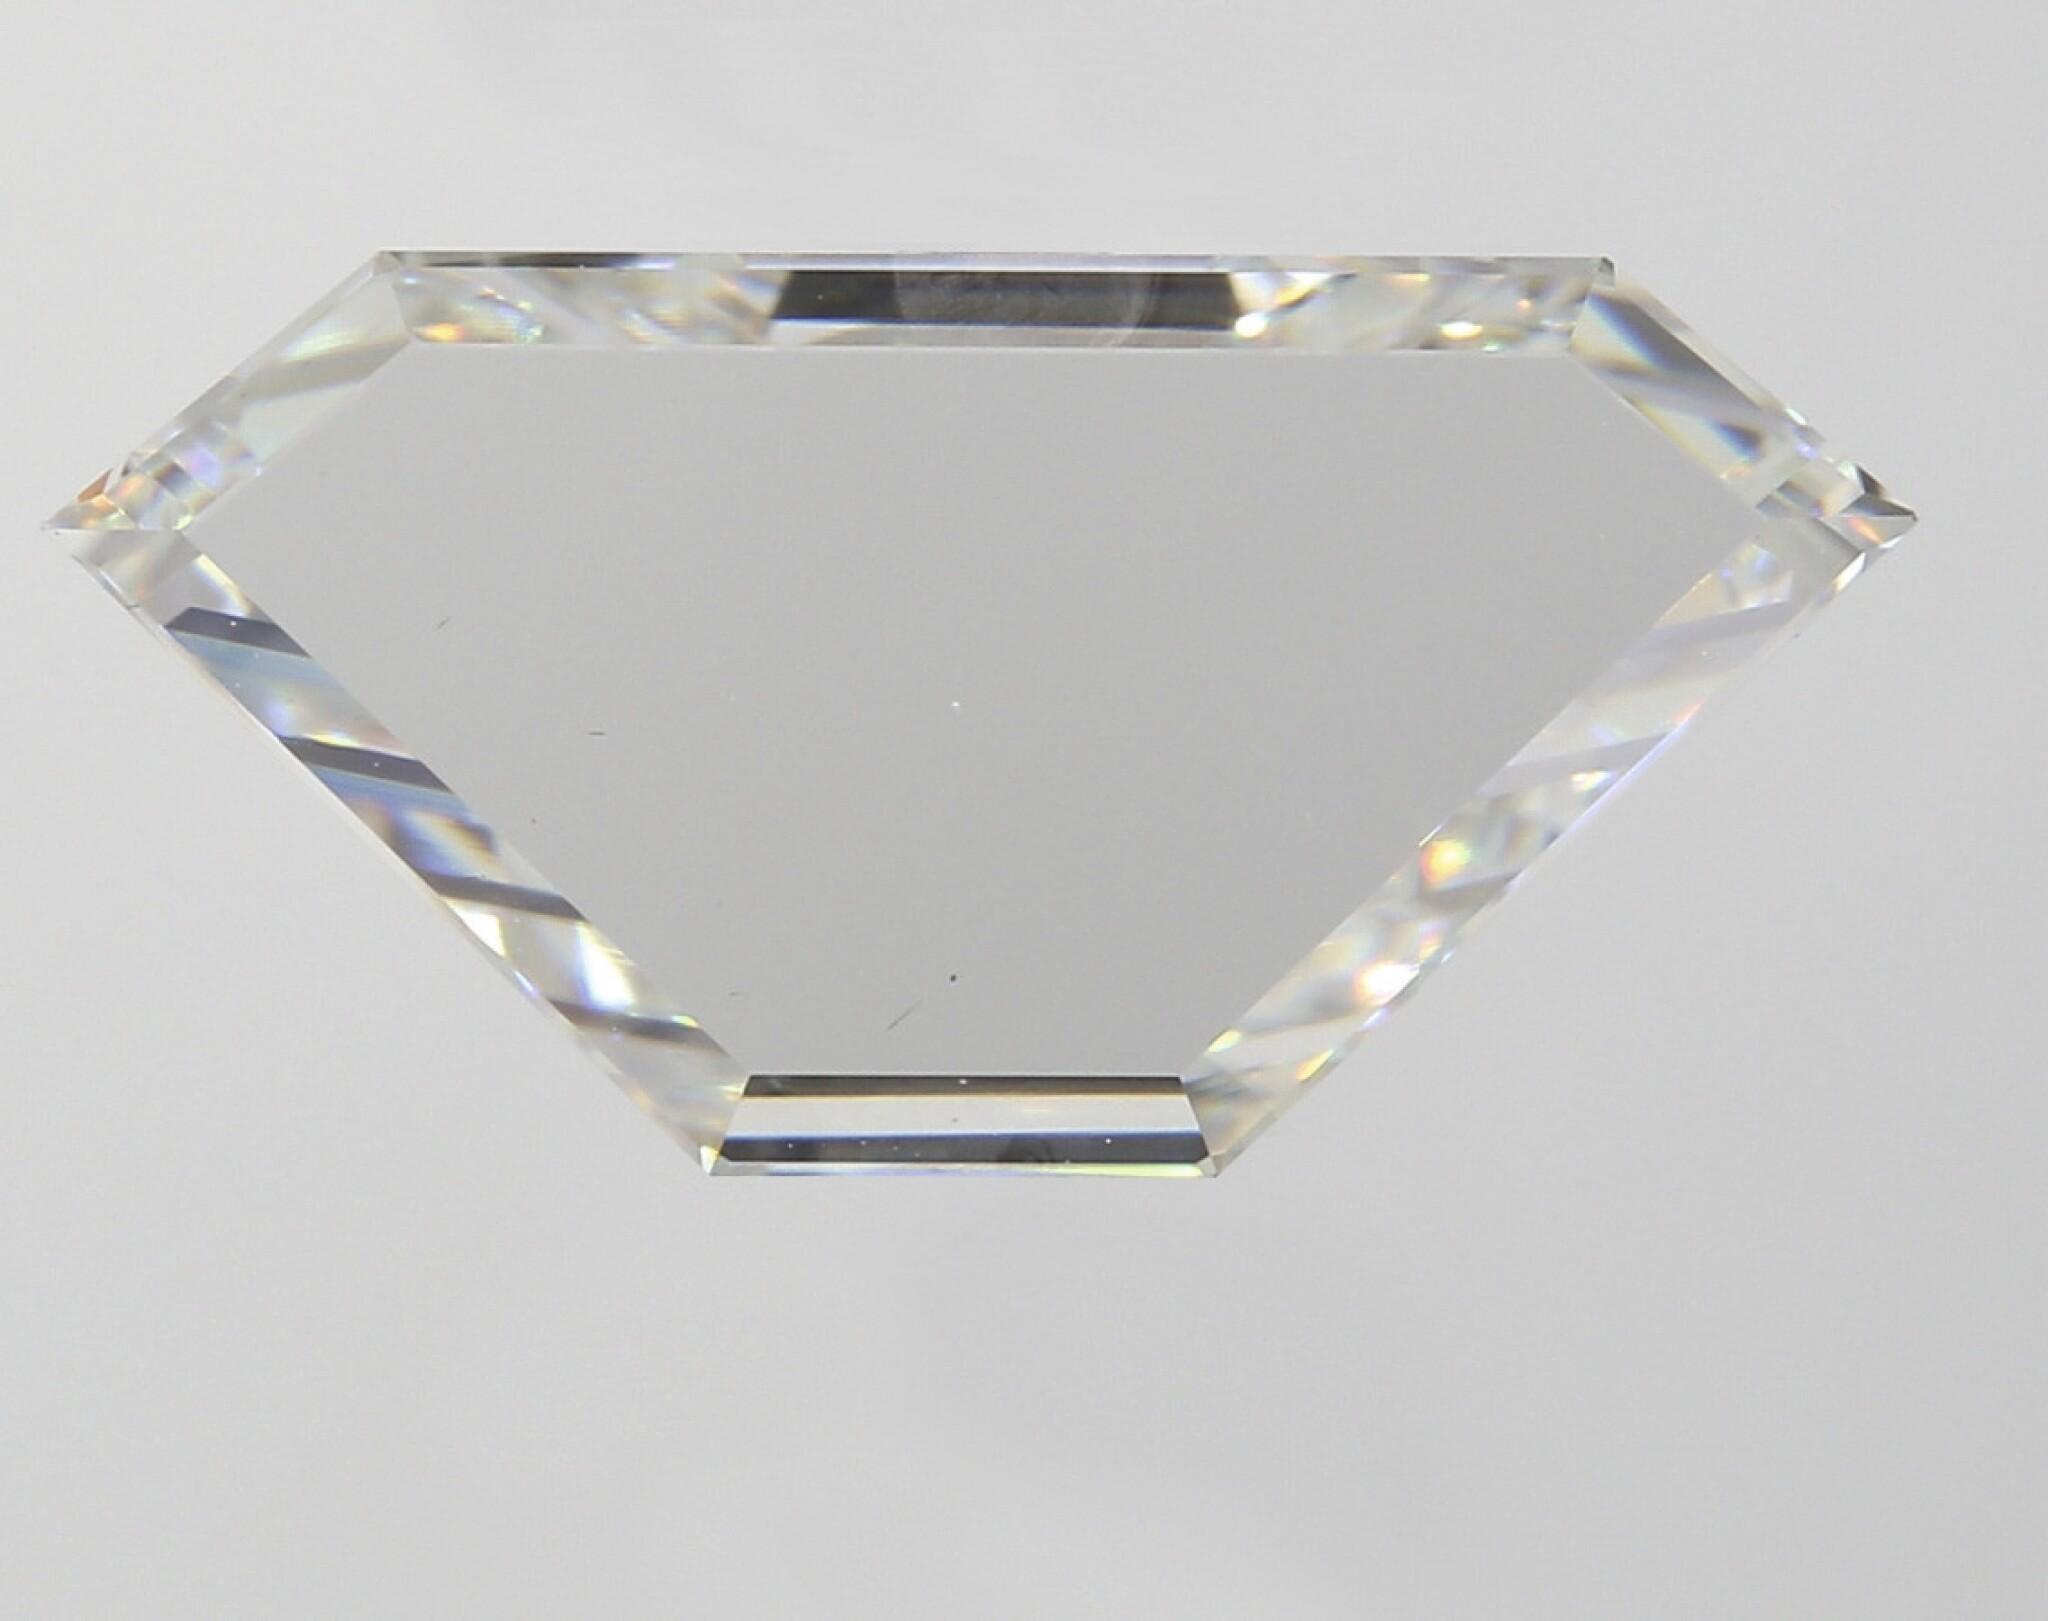 A 2.02 Modified Shield Step-Cut Diamond, I Color, VS1 Clarity